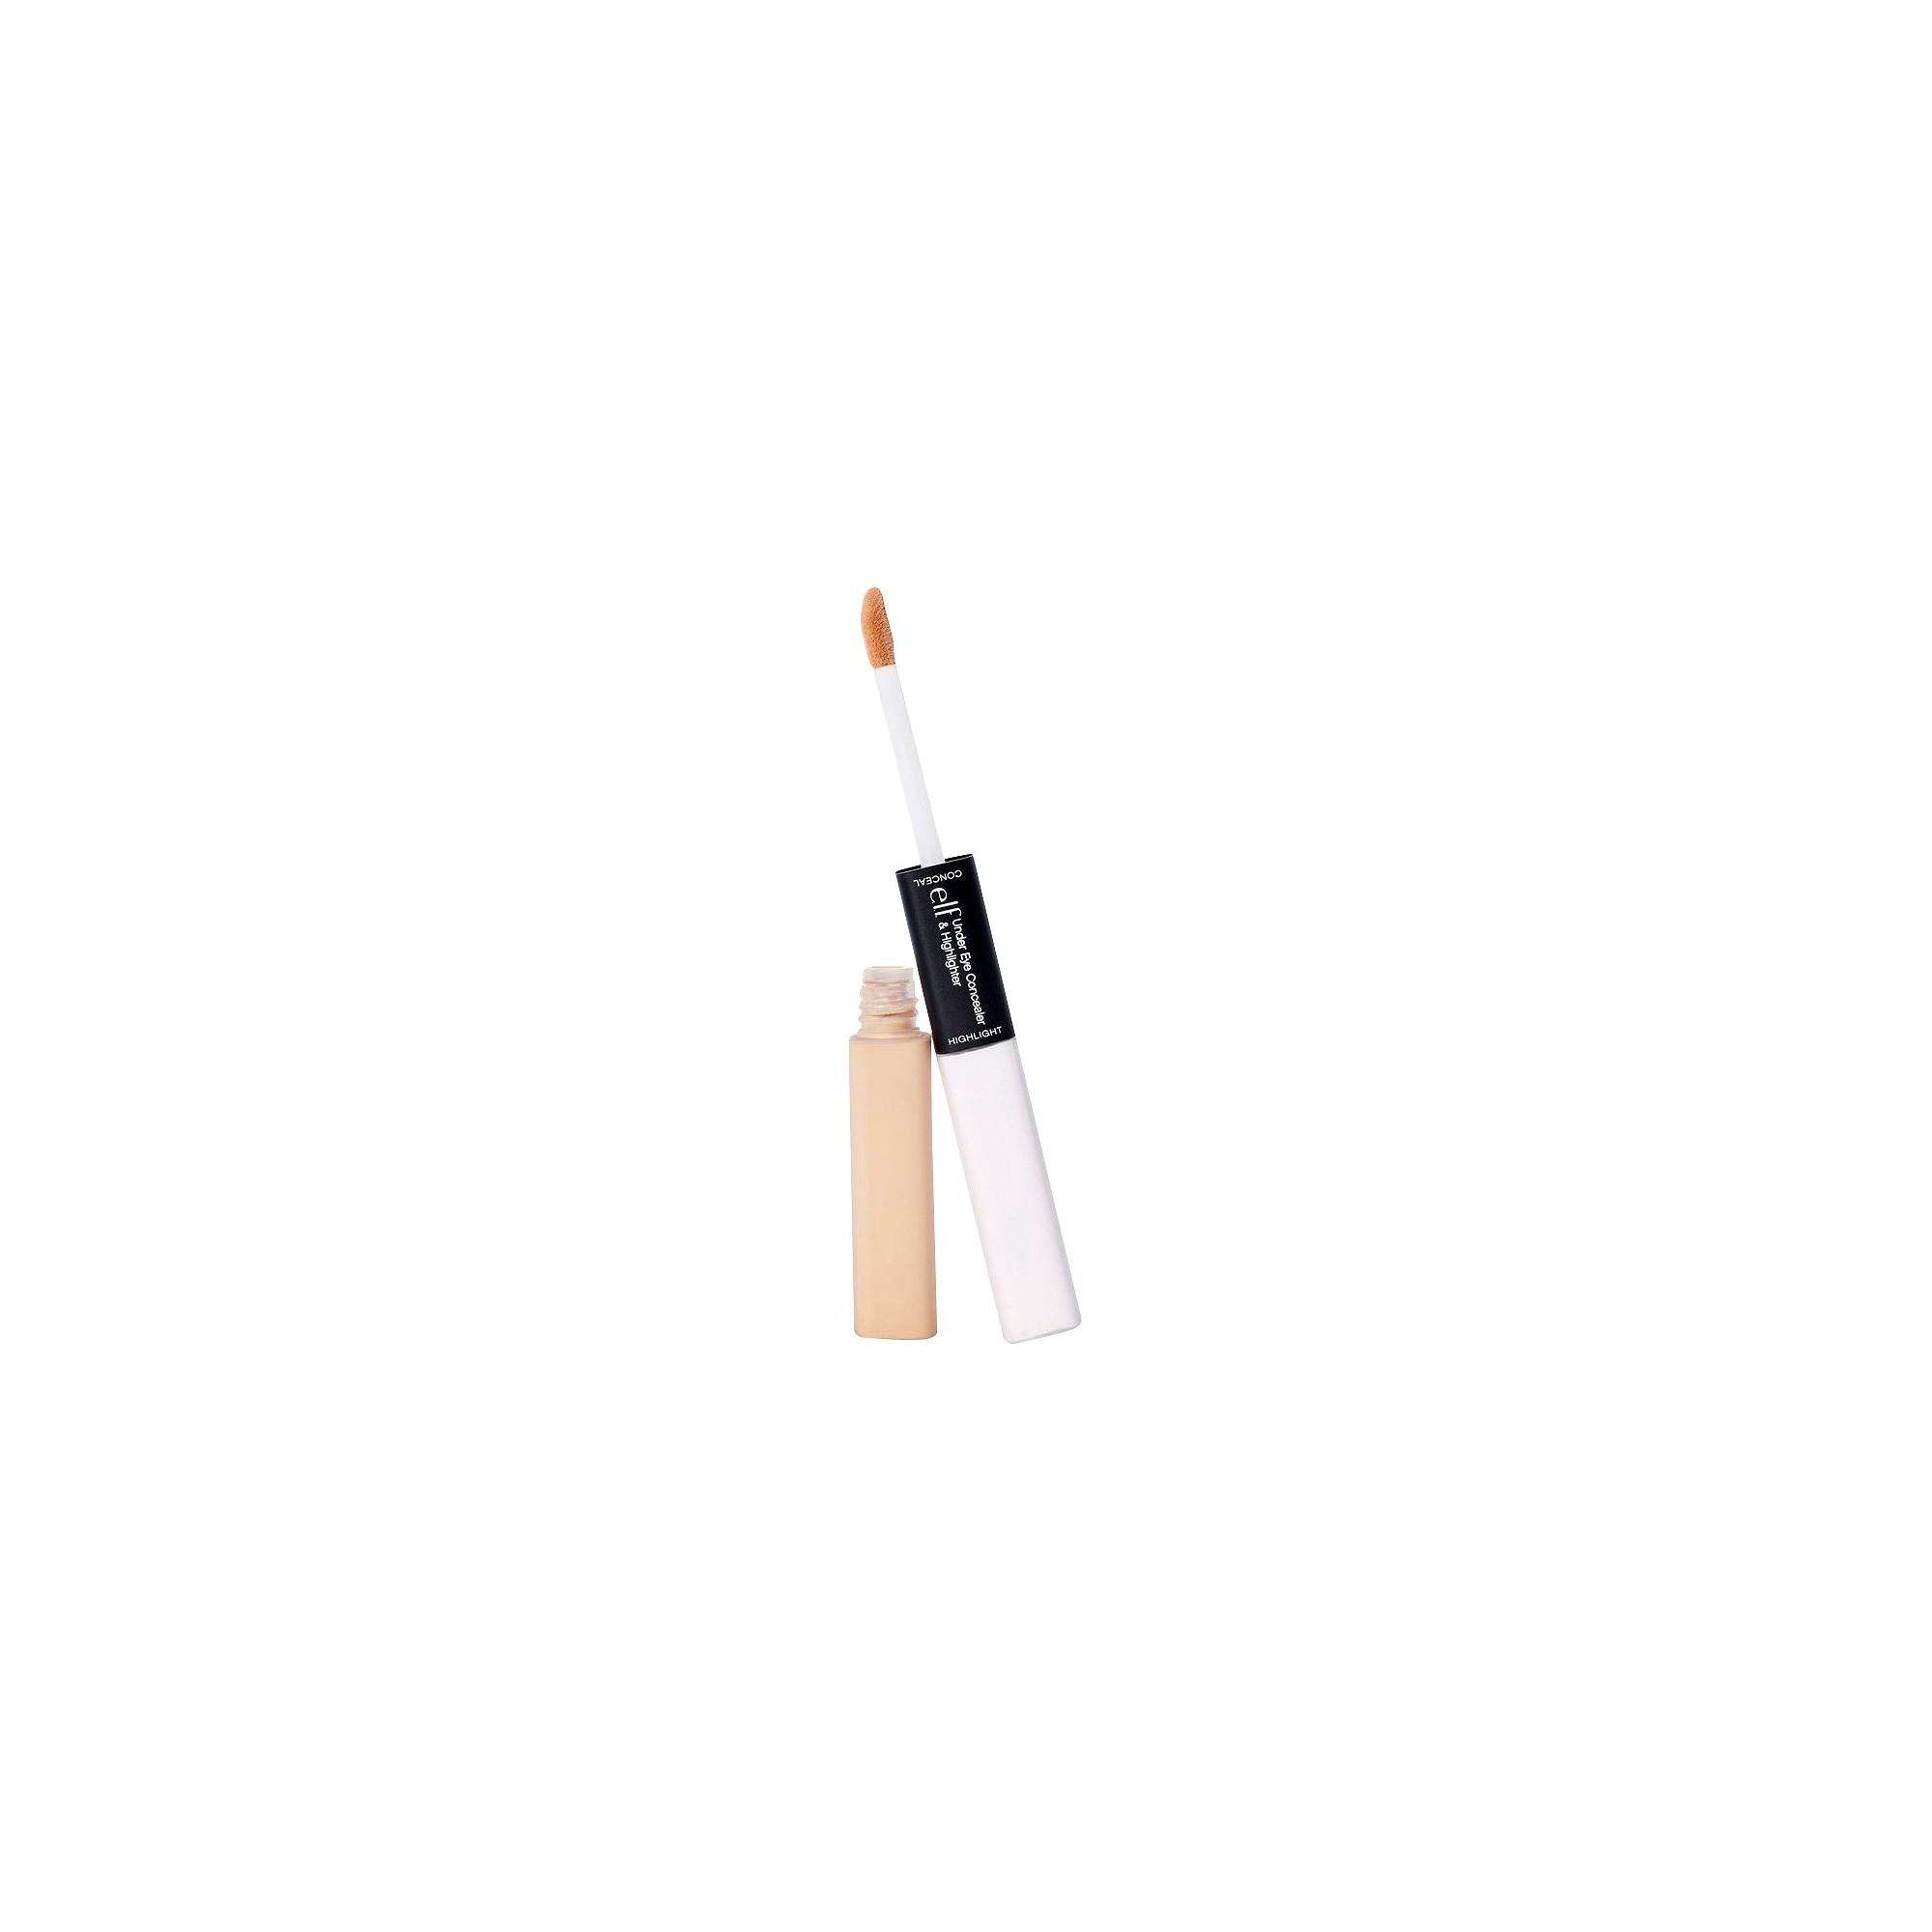 e.l.f. Undereye Concealer & Highlighter Glow/Fair - .4 fl oz